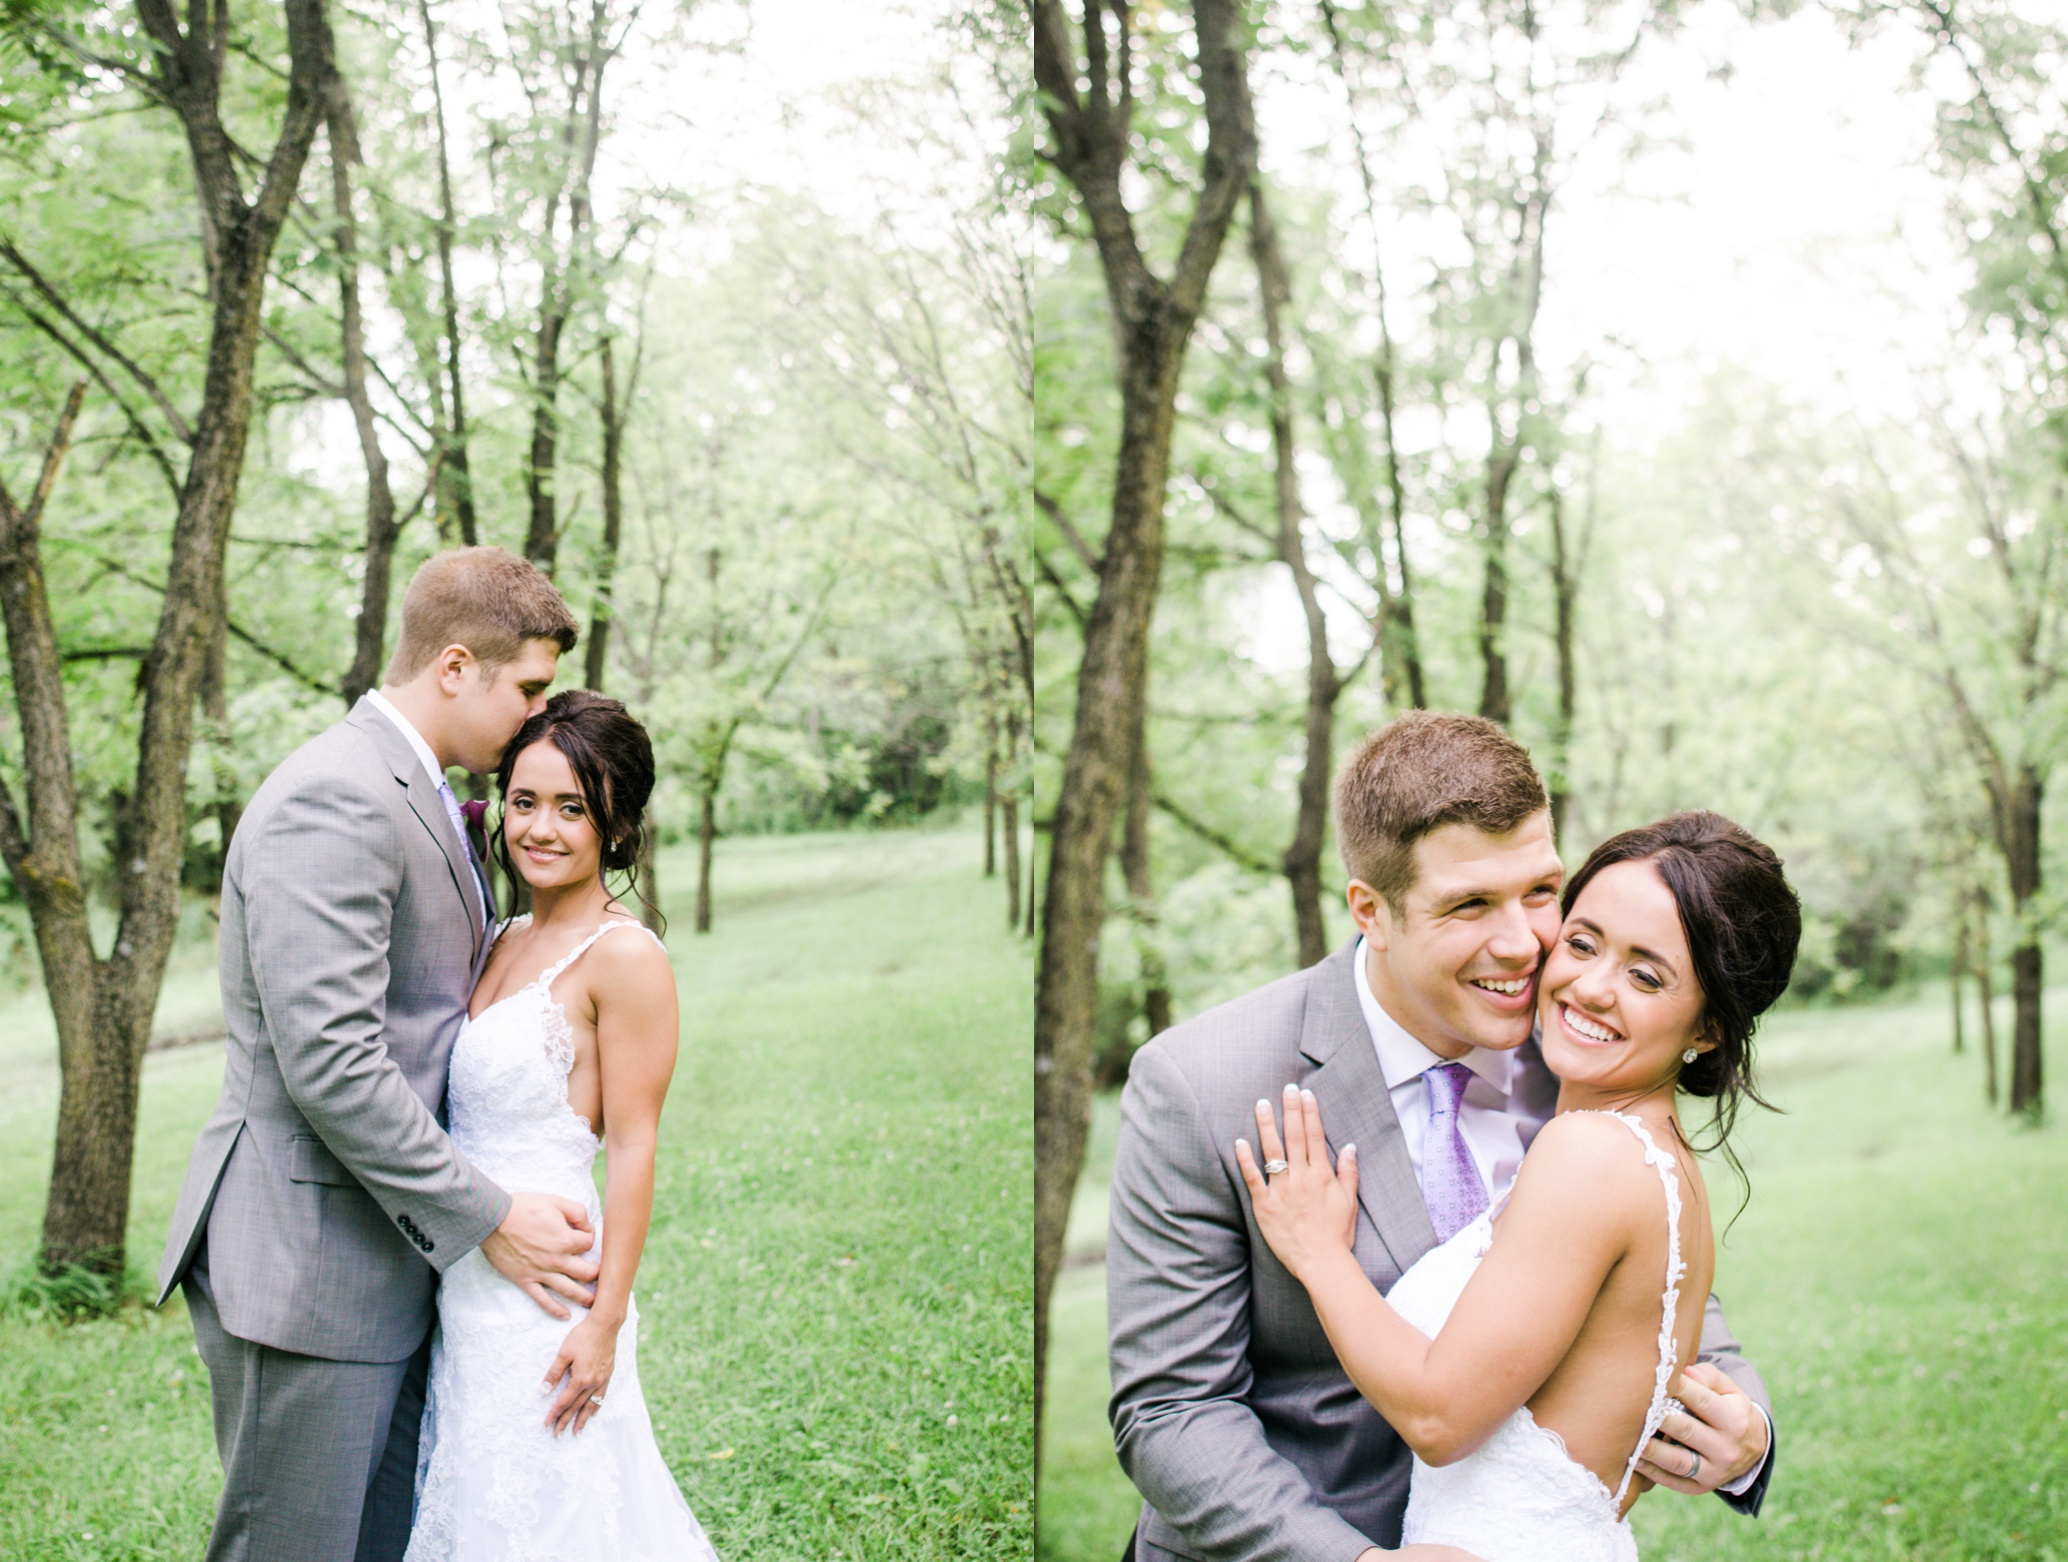 Barnes' Place Rustic Outdoor Wedding | Ali Leigh Photo Minneapolis Wedding Photographer_0153.jpg